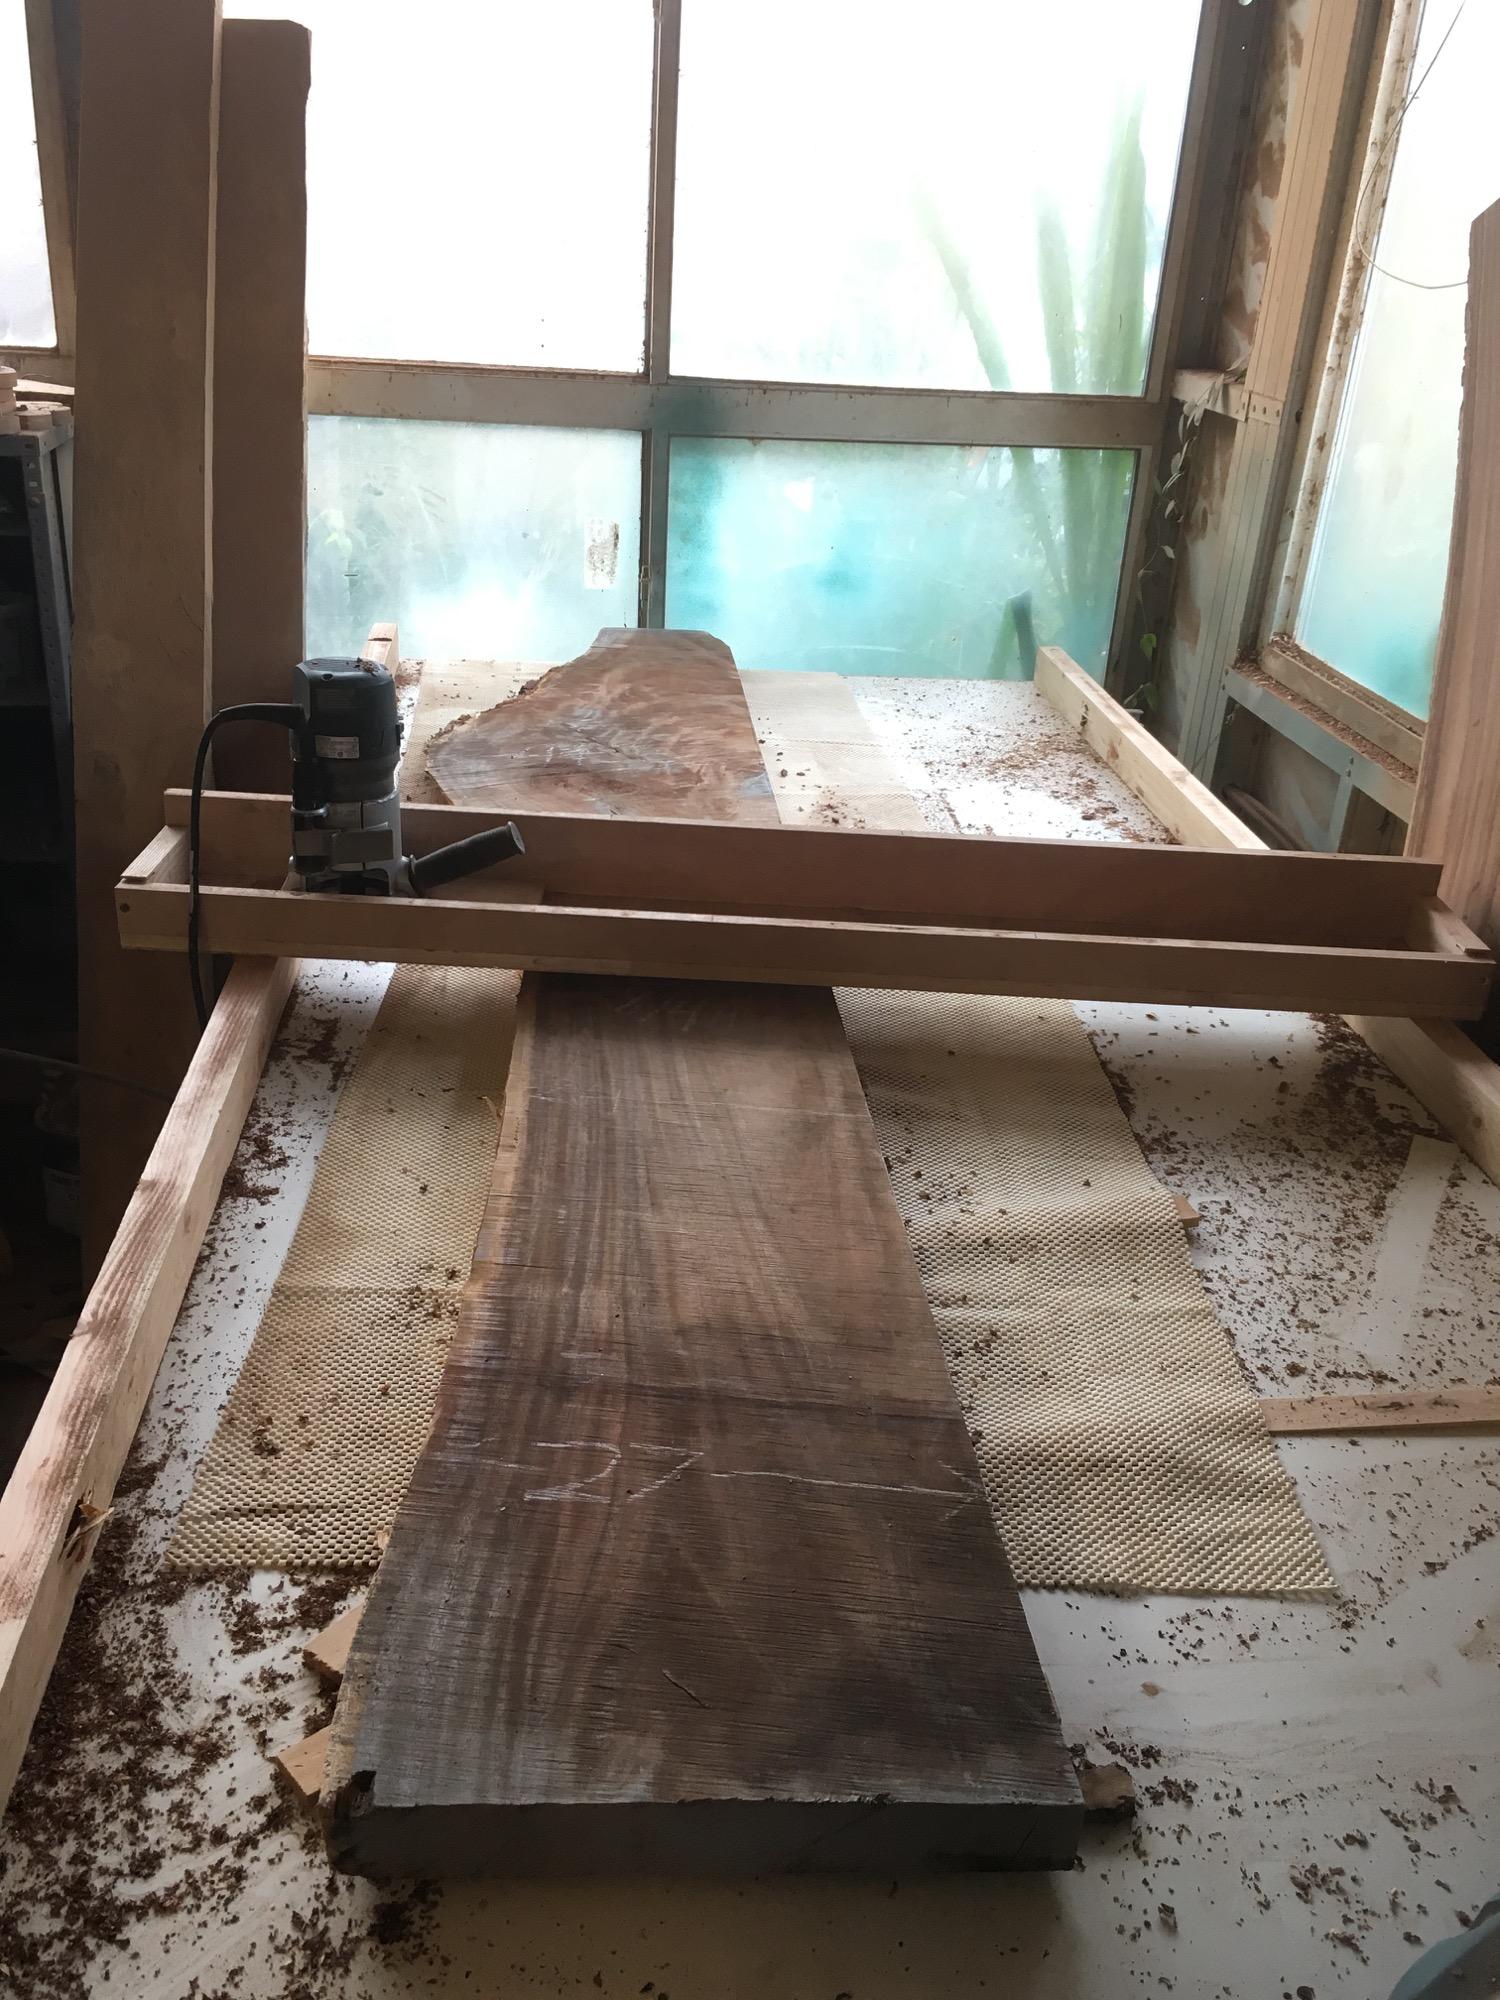 Monkeypod slab pre-flattening